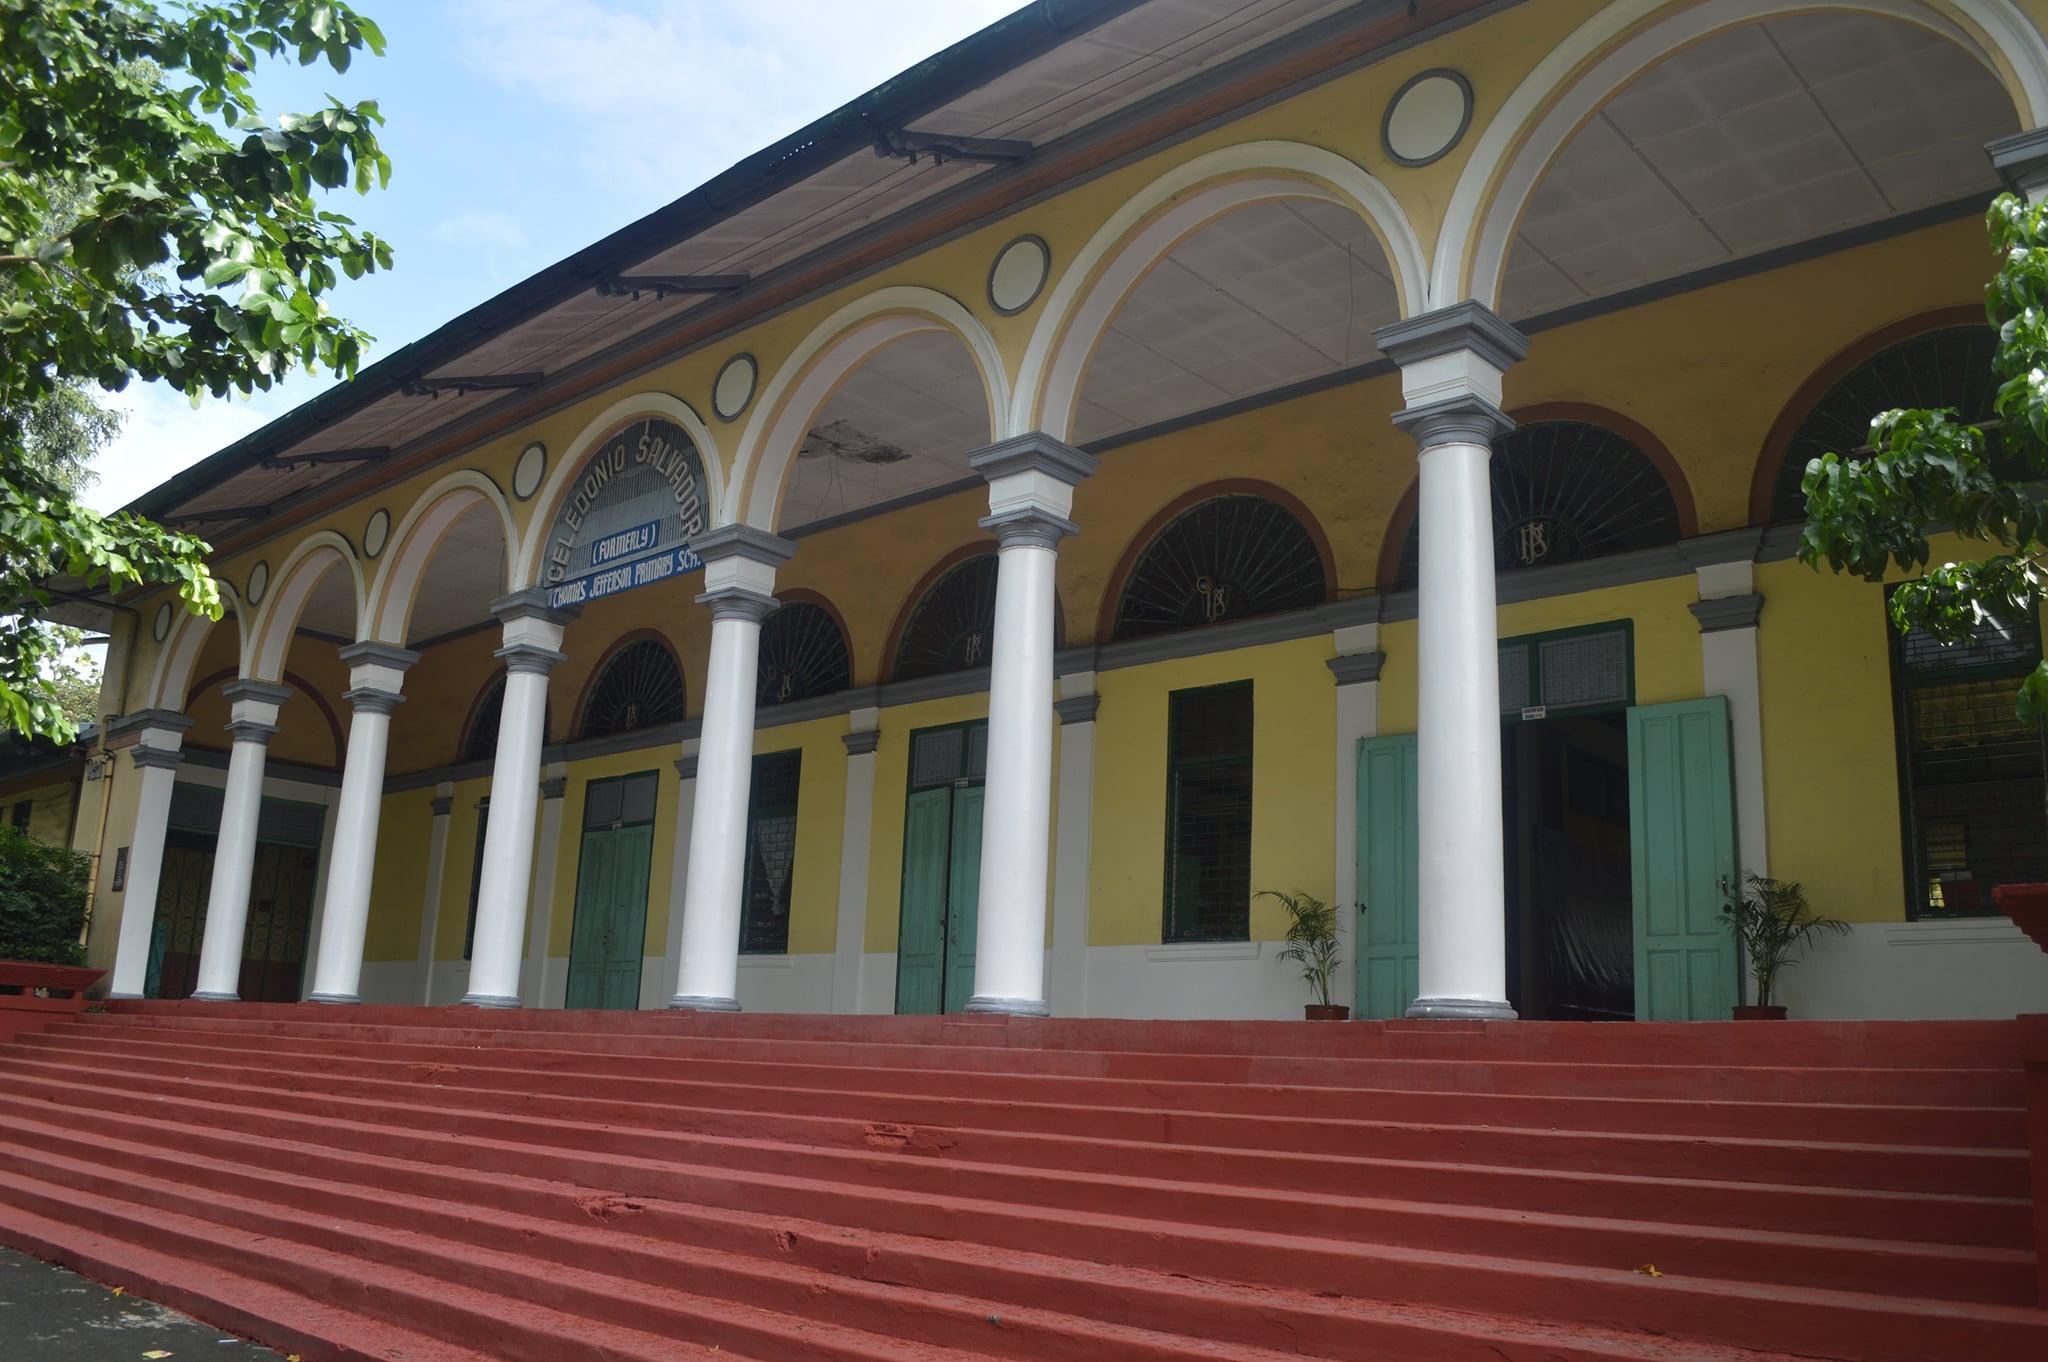 front façade of the Gabaldon school building of Dr. Celedonio A. Salvador Elementary School